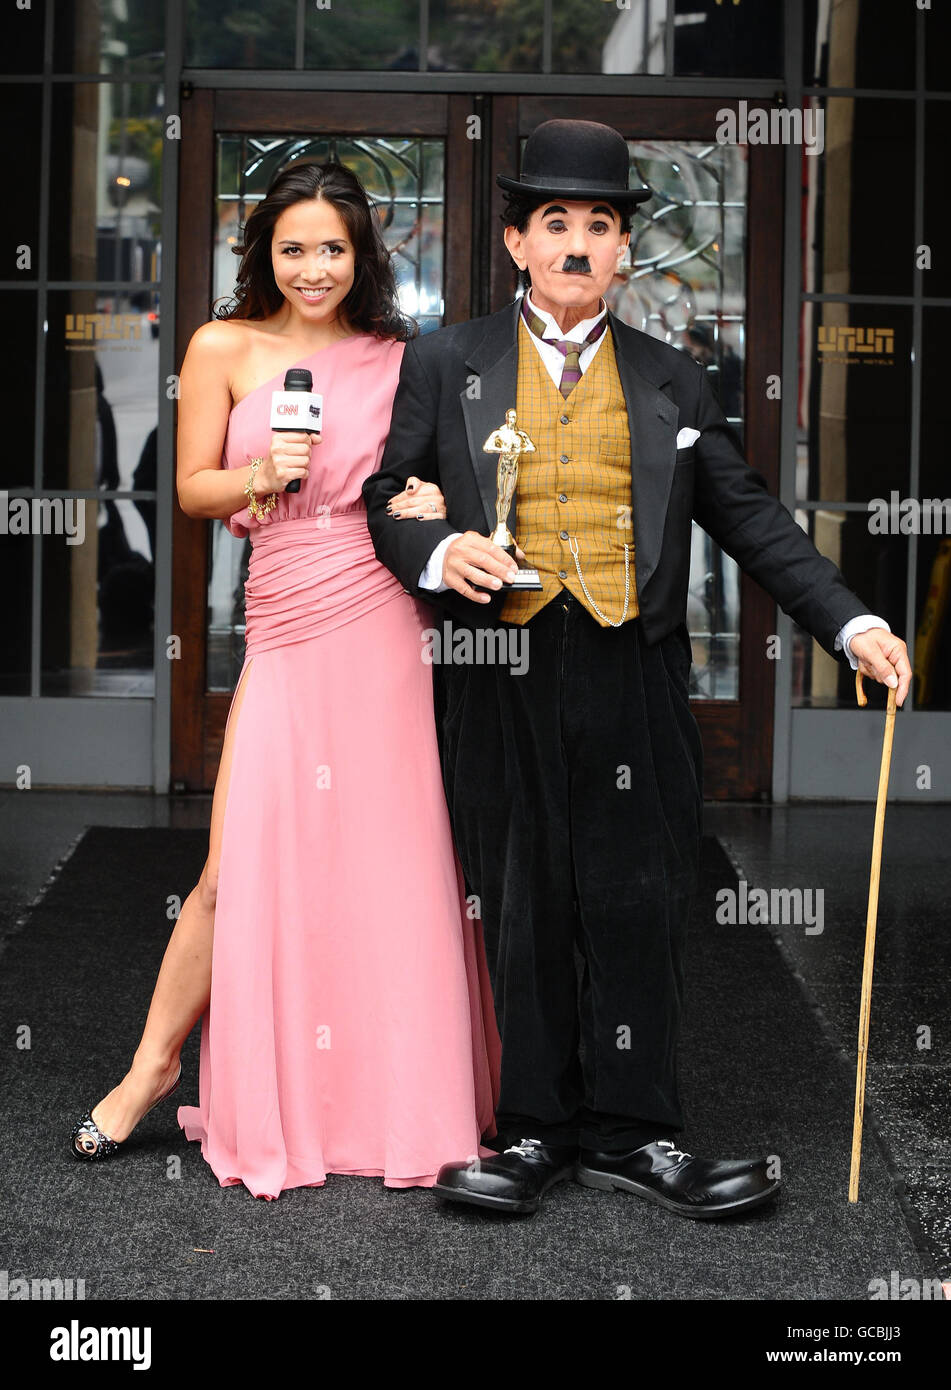 Myleene Klass for CNN at The Oscars 2010 - Los Angeles - Stock Image